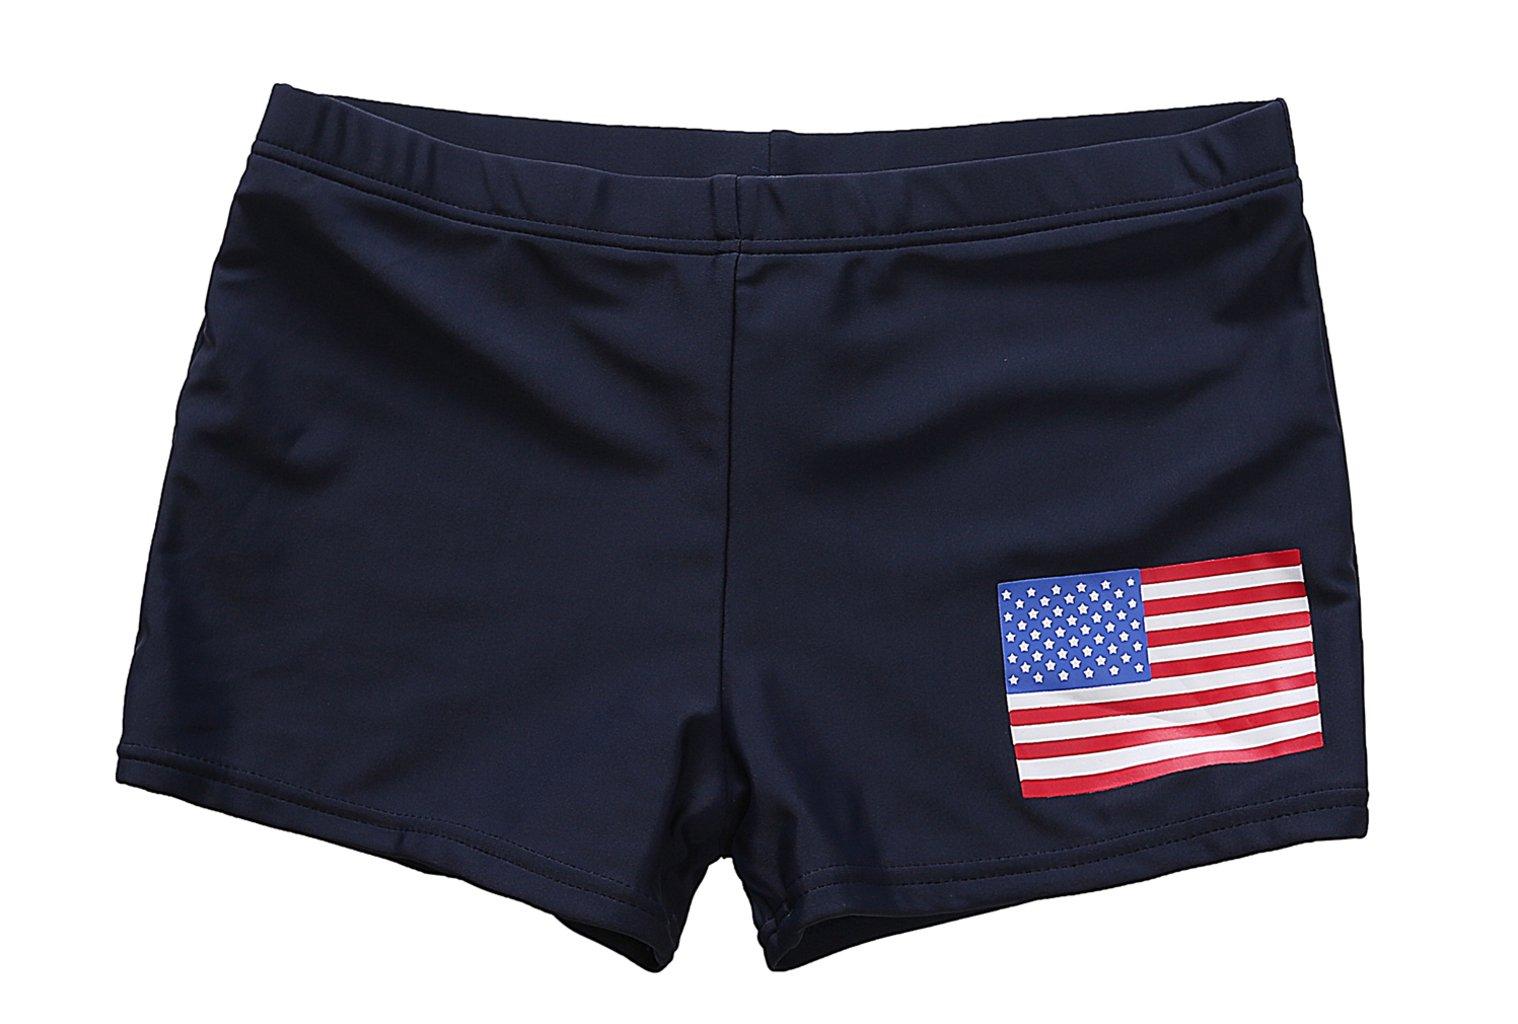 BeautyIn Boys Swim Shorts Stars and Stripes American Flag Swimwear 6,Navy,5-6 years